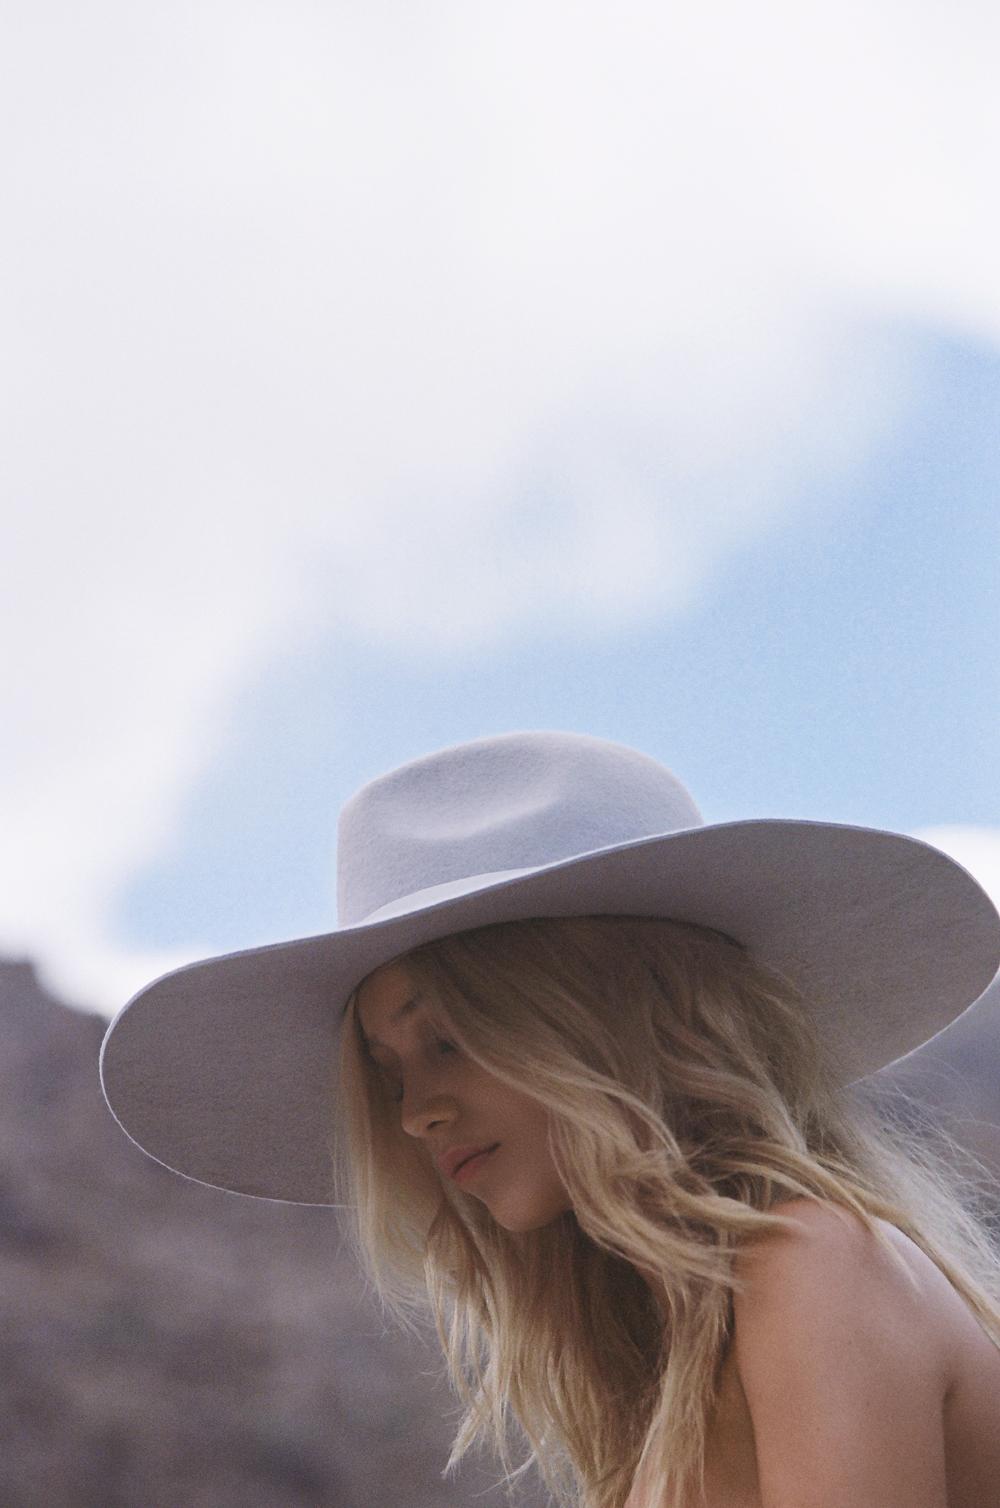 Model wearing lack of color hat